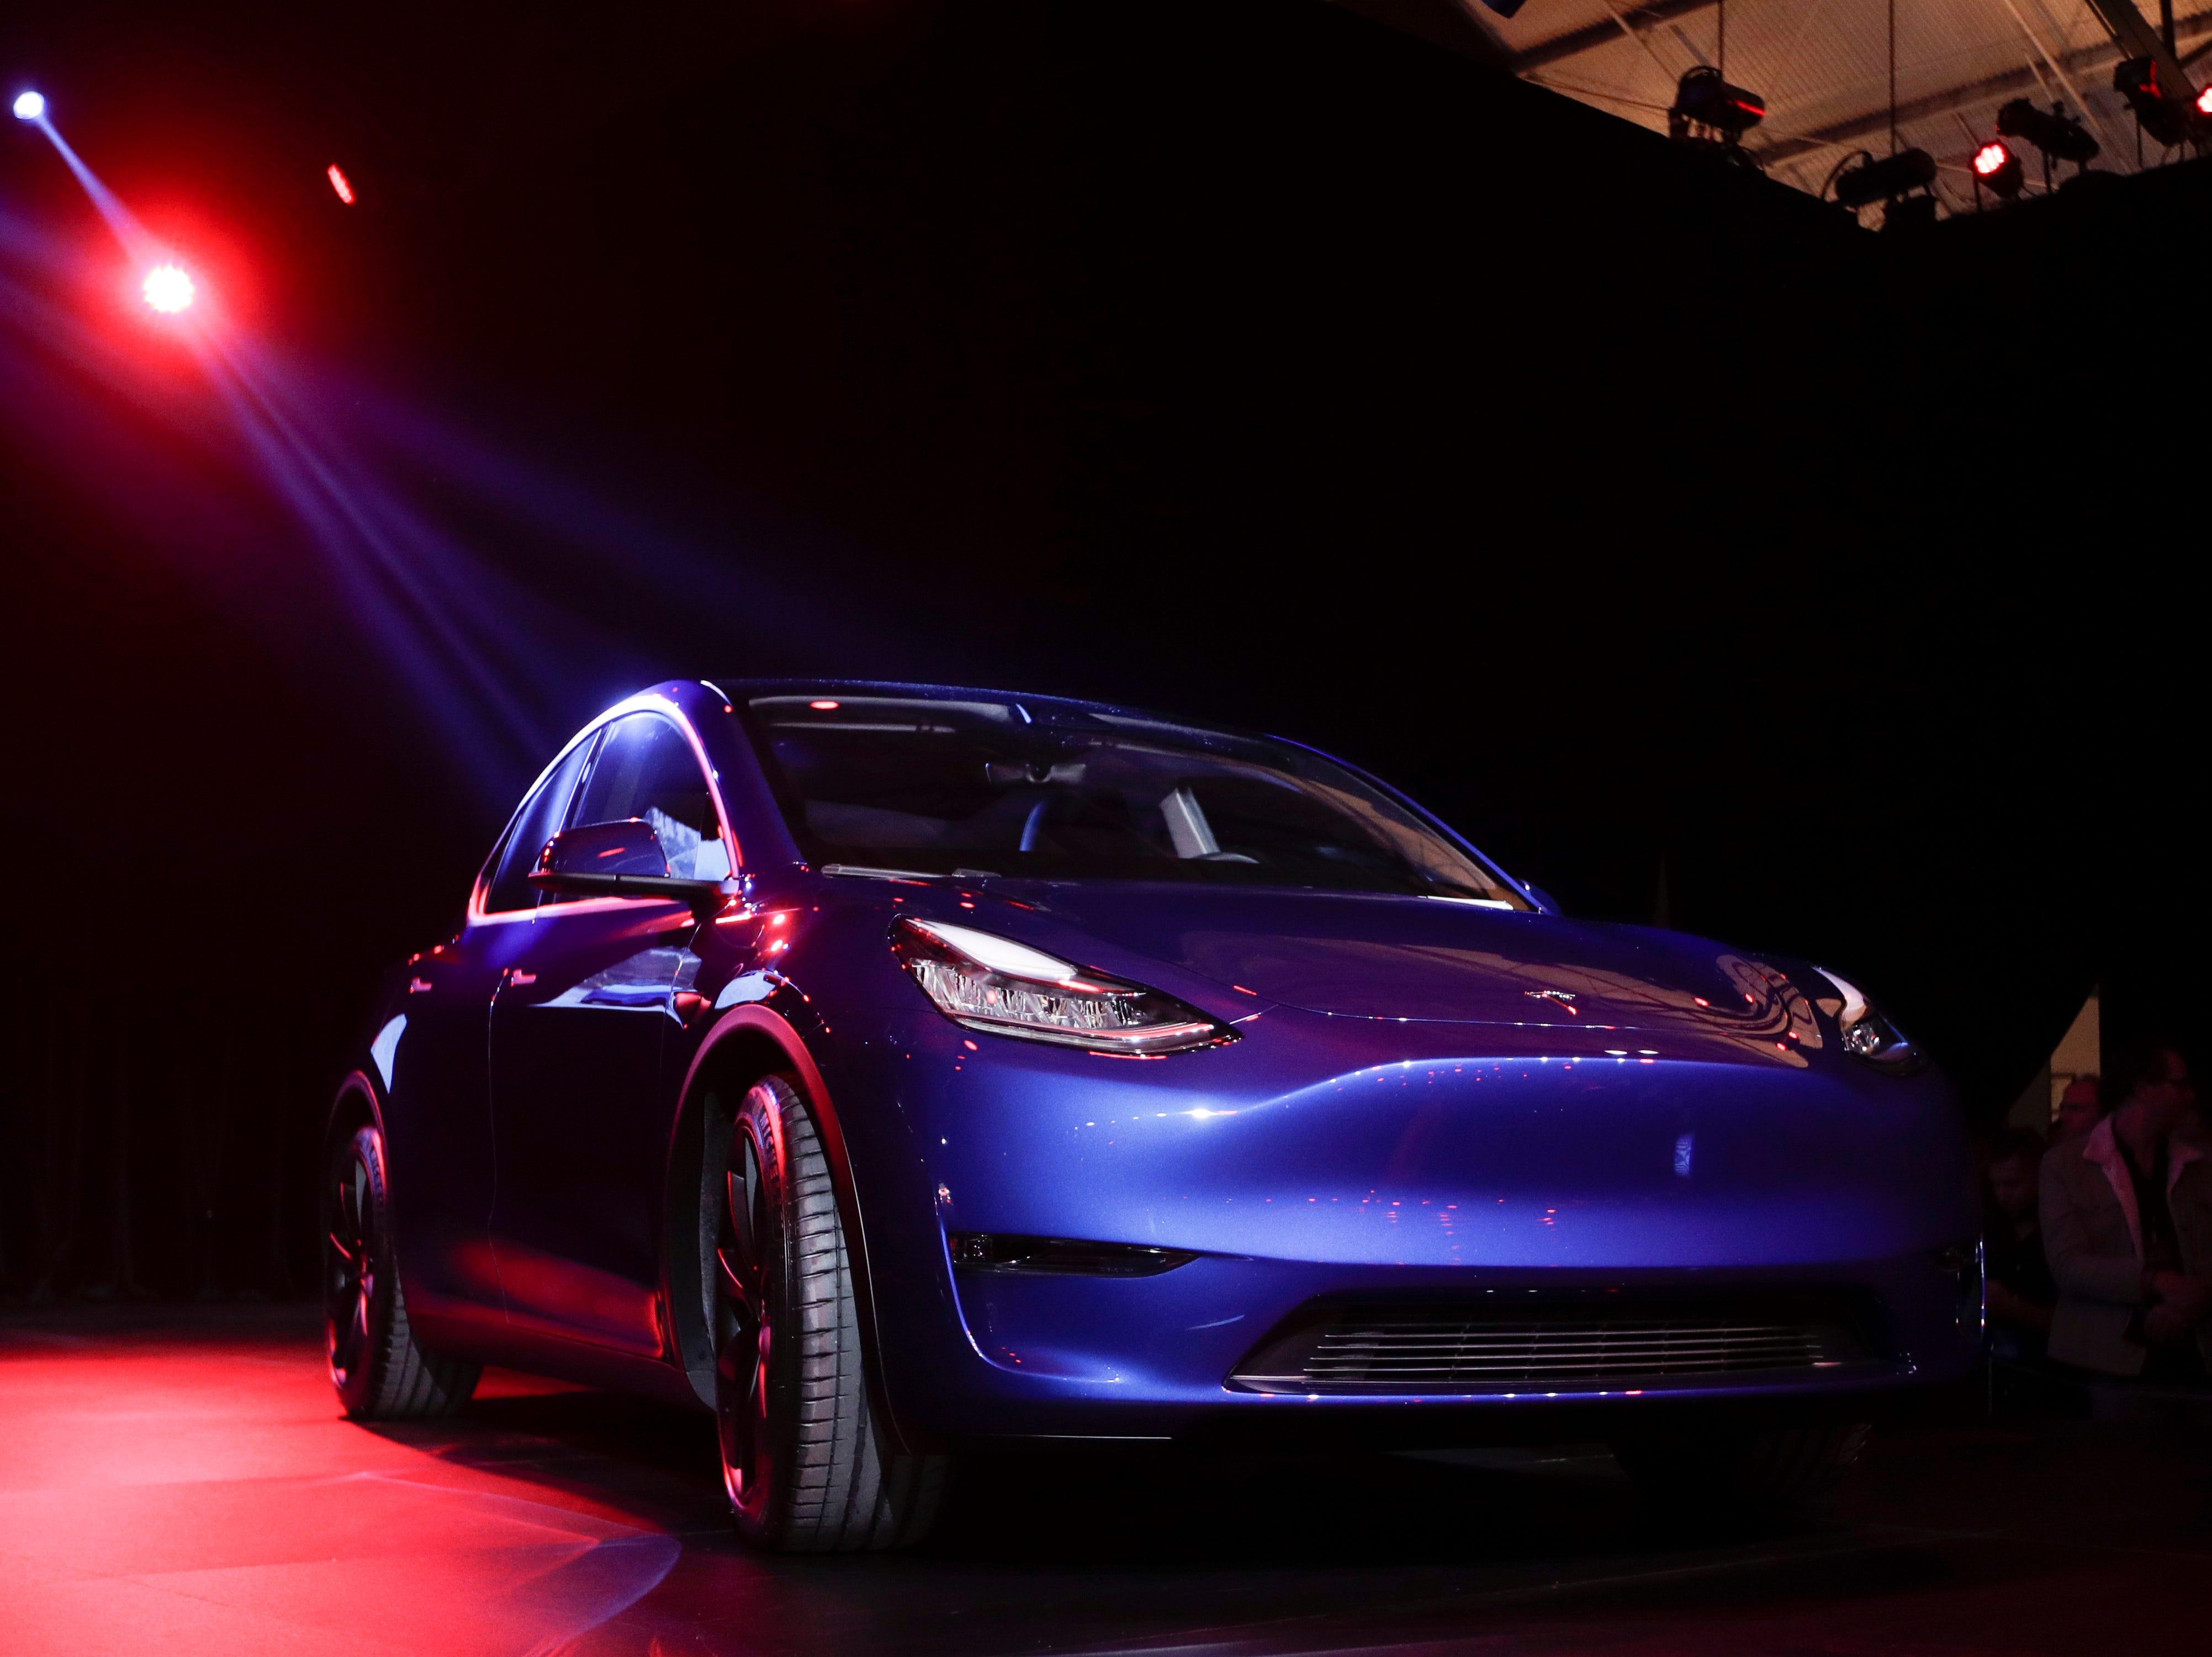 The Tesla Model Y is unveiled at Tesla's design studio in Hawthorne, Calif. Thursday, March 14, 2019.